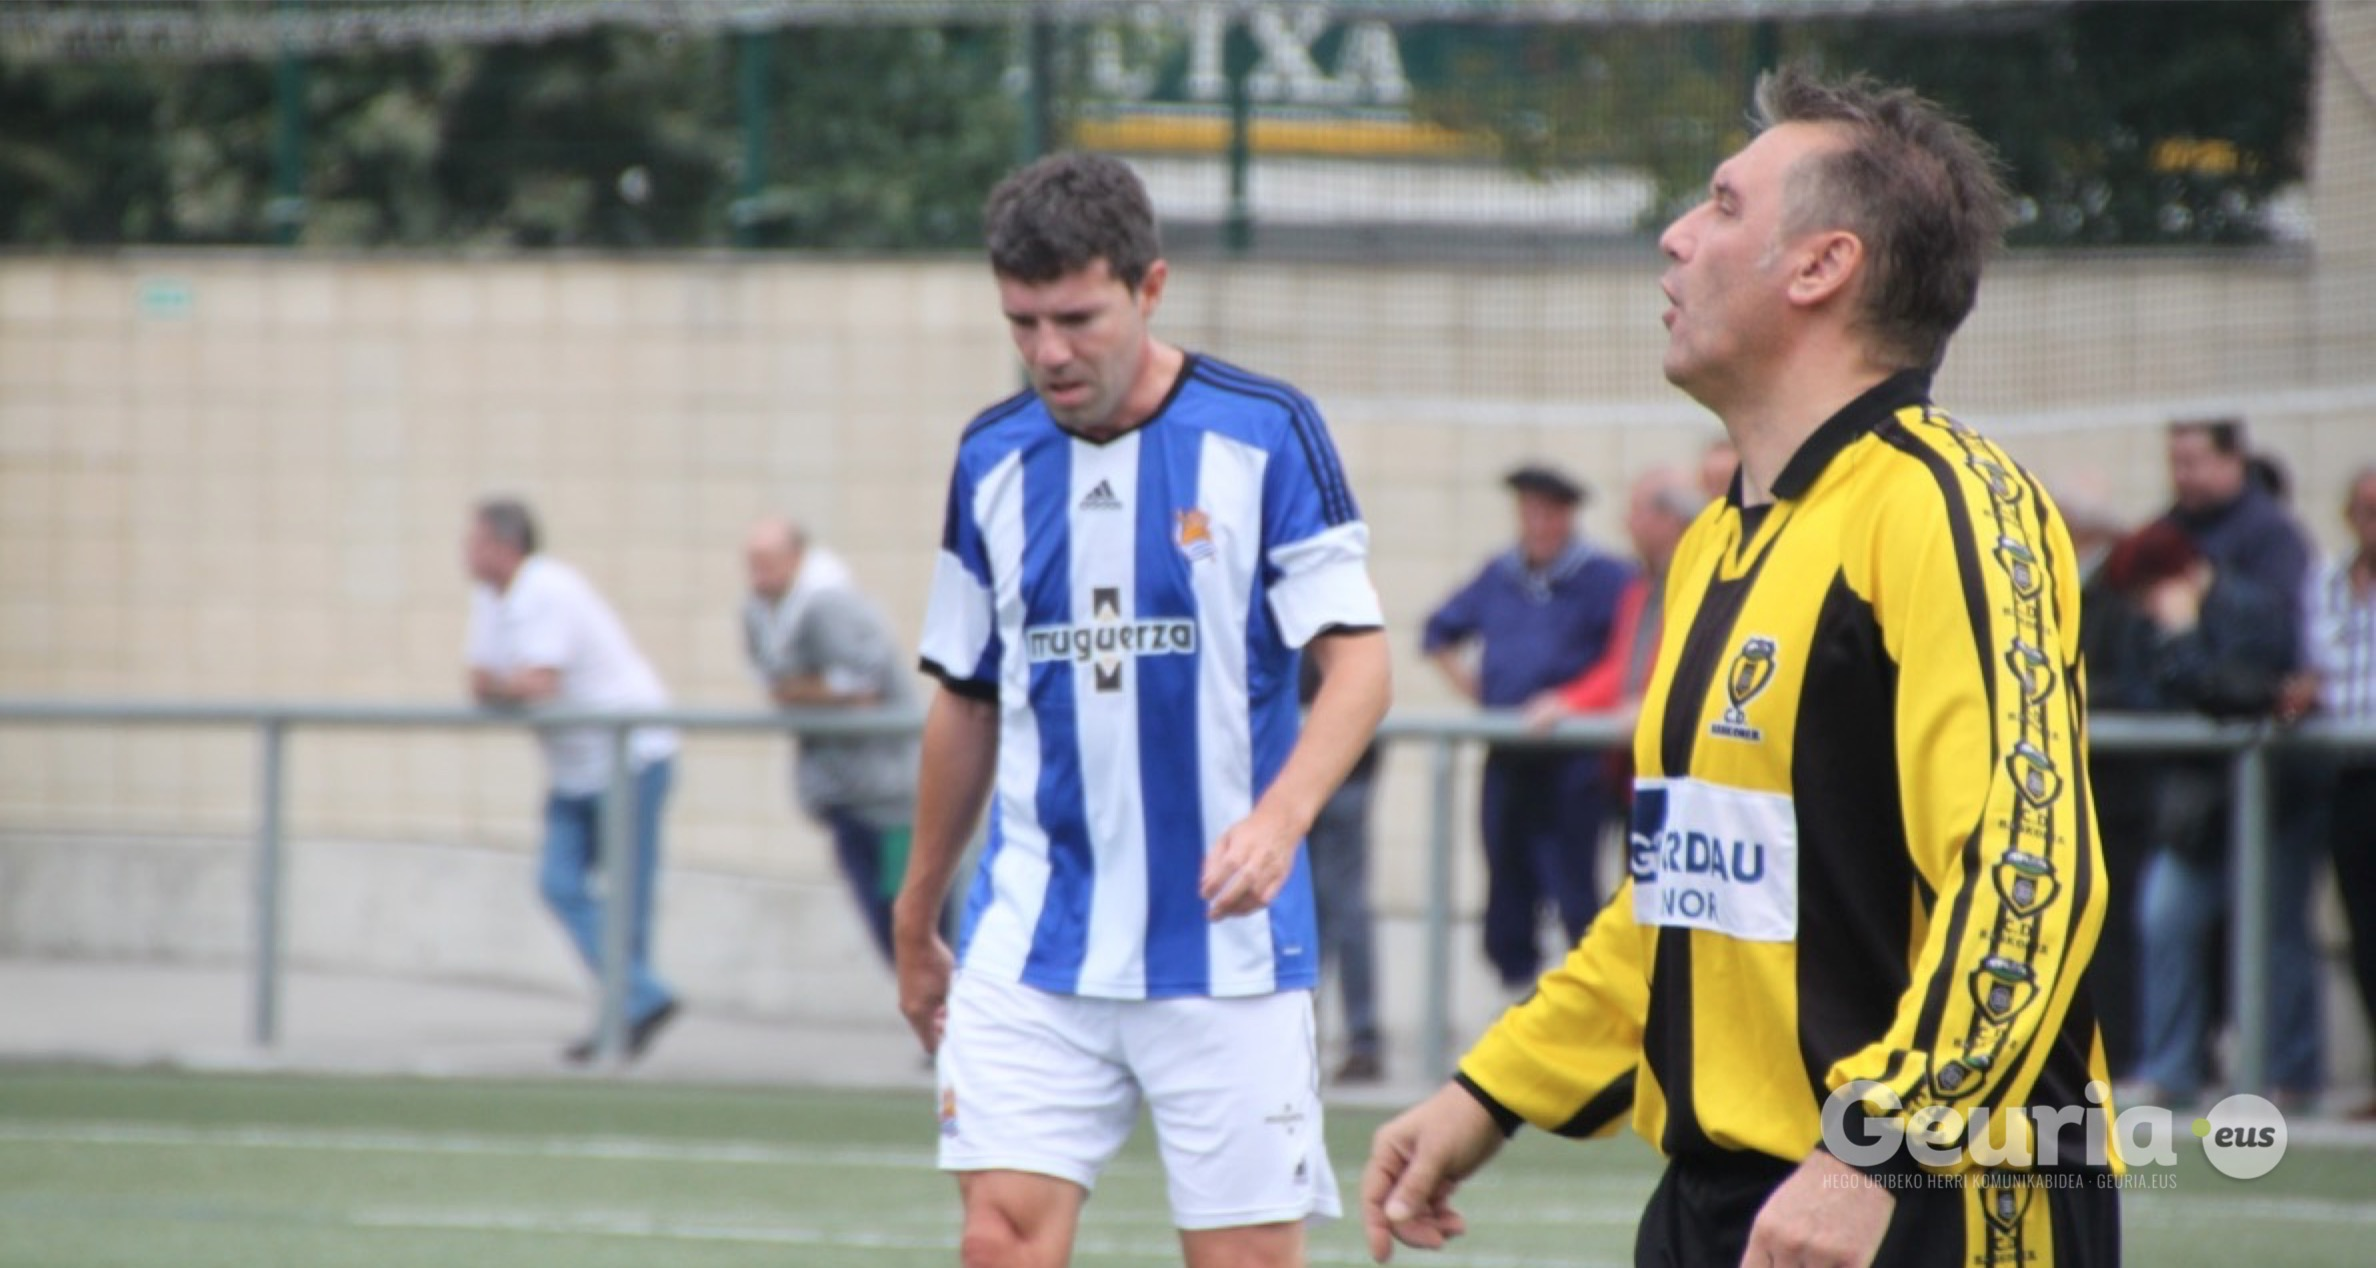 basauri_san_fausto_2015_futbol_basconia_beteranoak_16